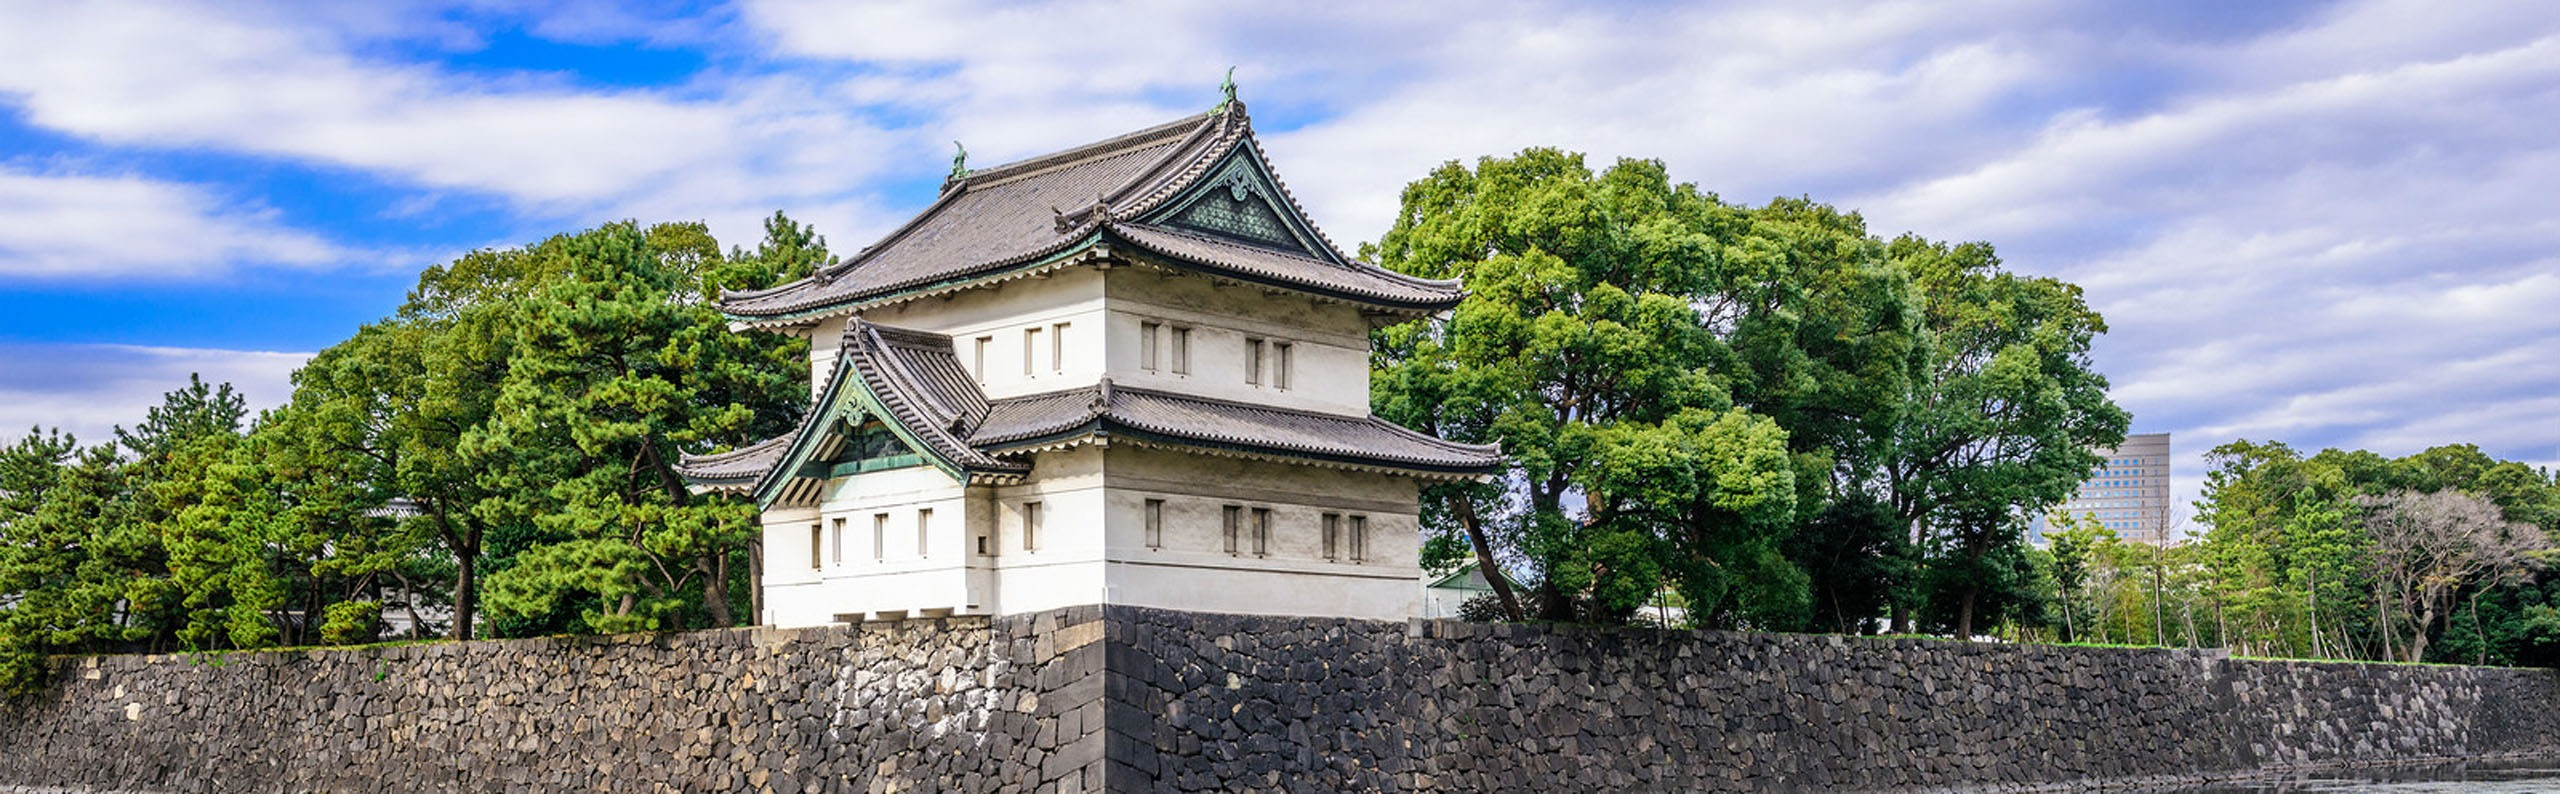 Ukiyo-e: Japanese Wood-Block Prints